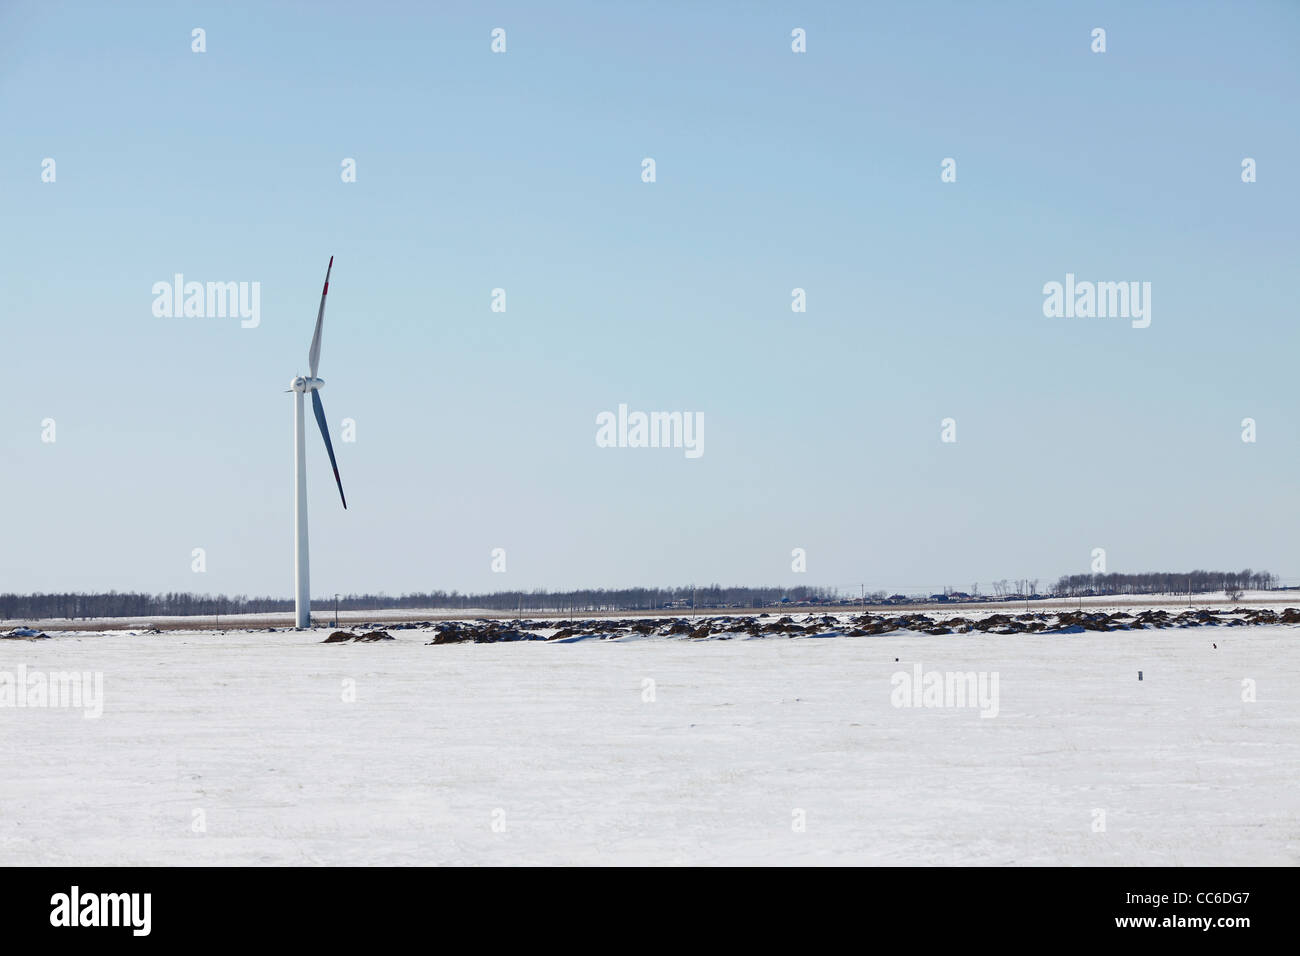 Windgenerator auf Ebene, Xianghai National Nature Reserve, Baicheng, Jilin, China Stockbild